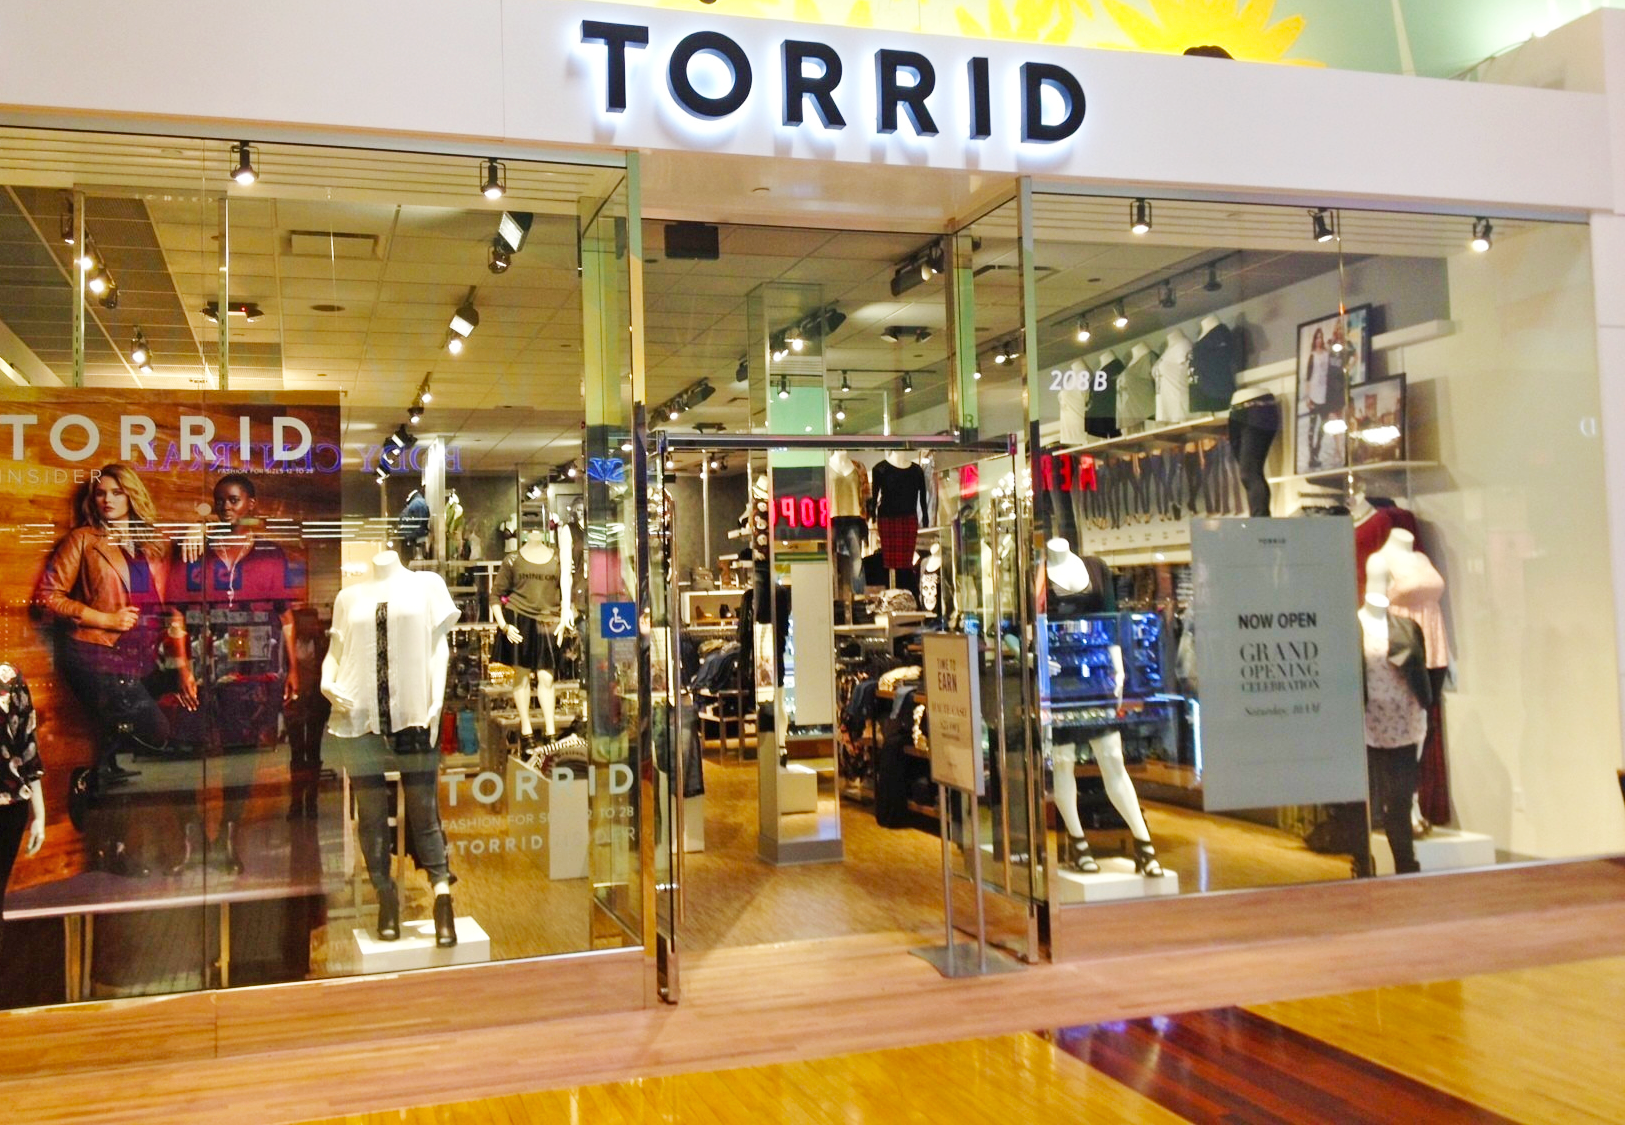 Torrids clothing store